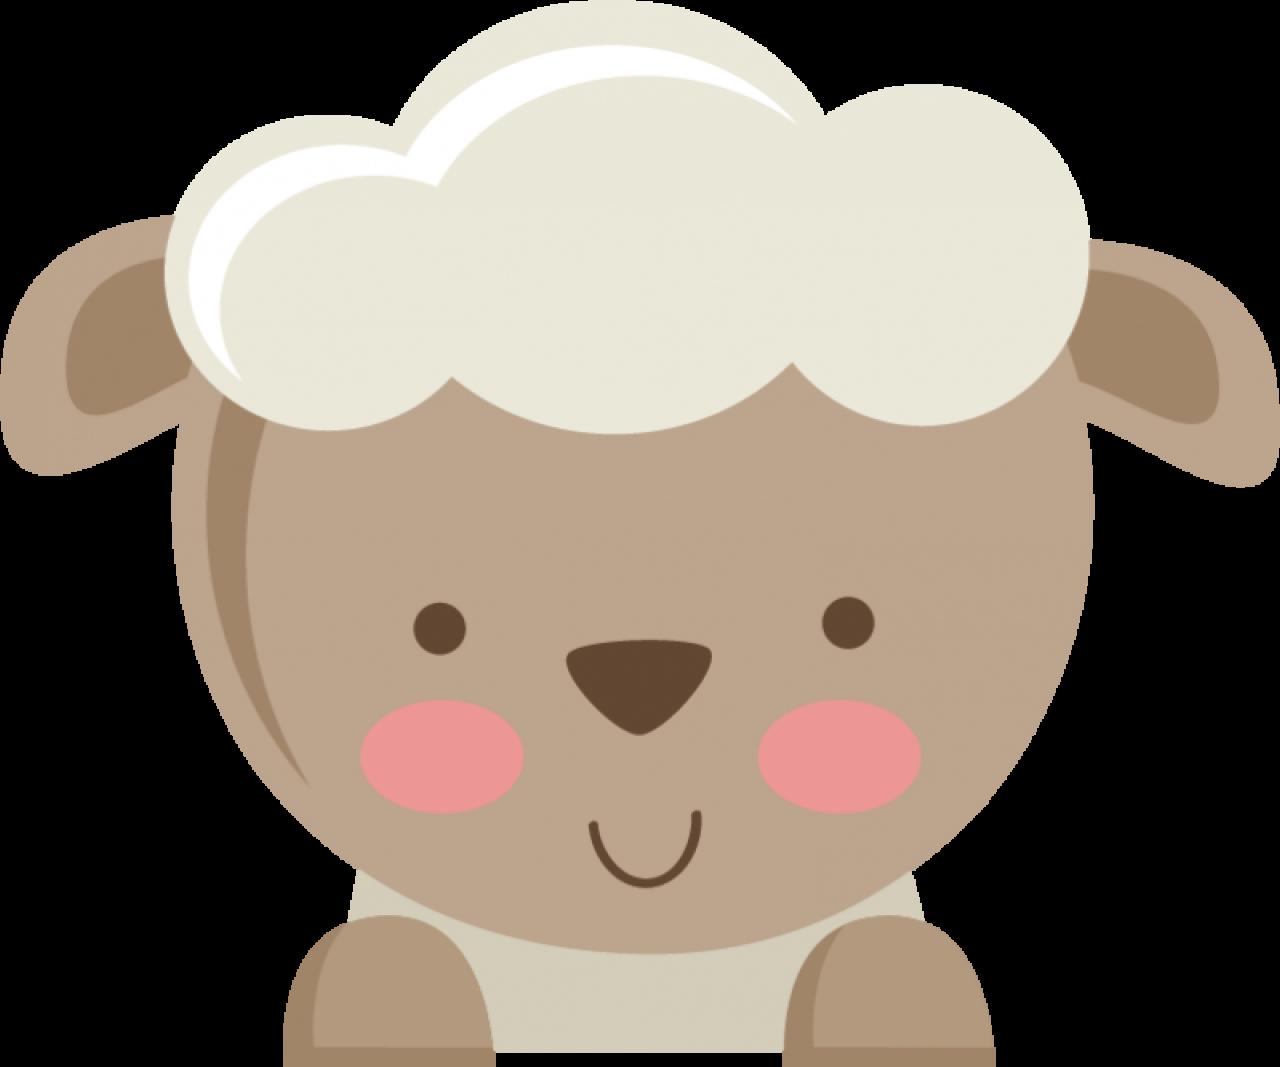 lamb clipart free photo download.